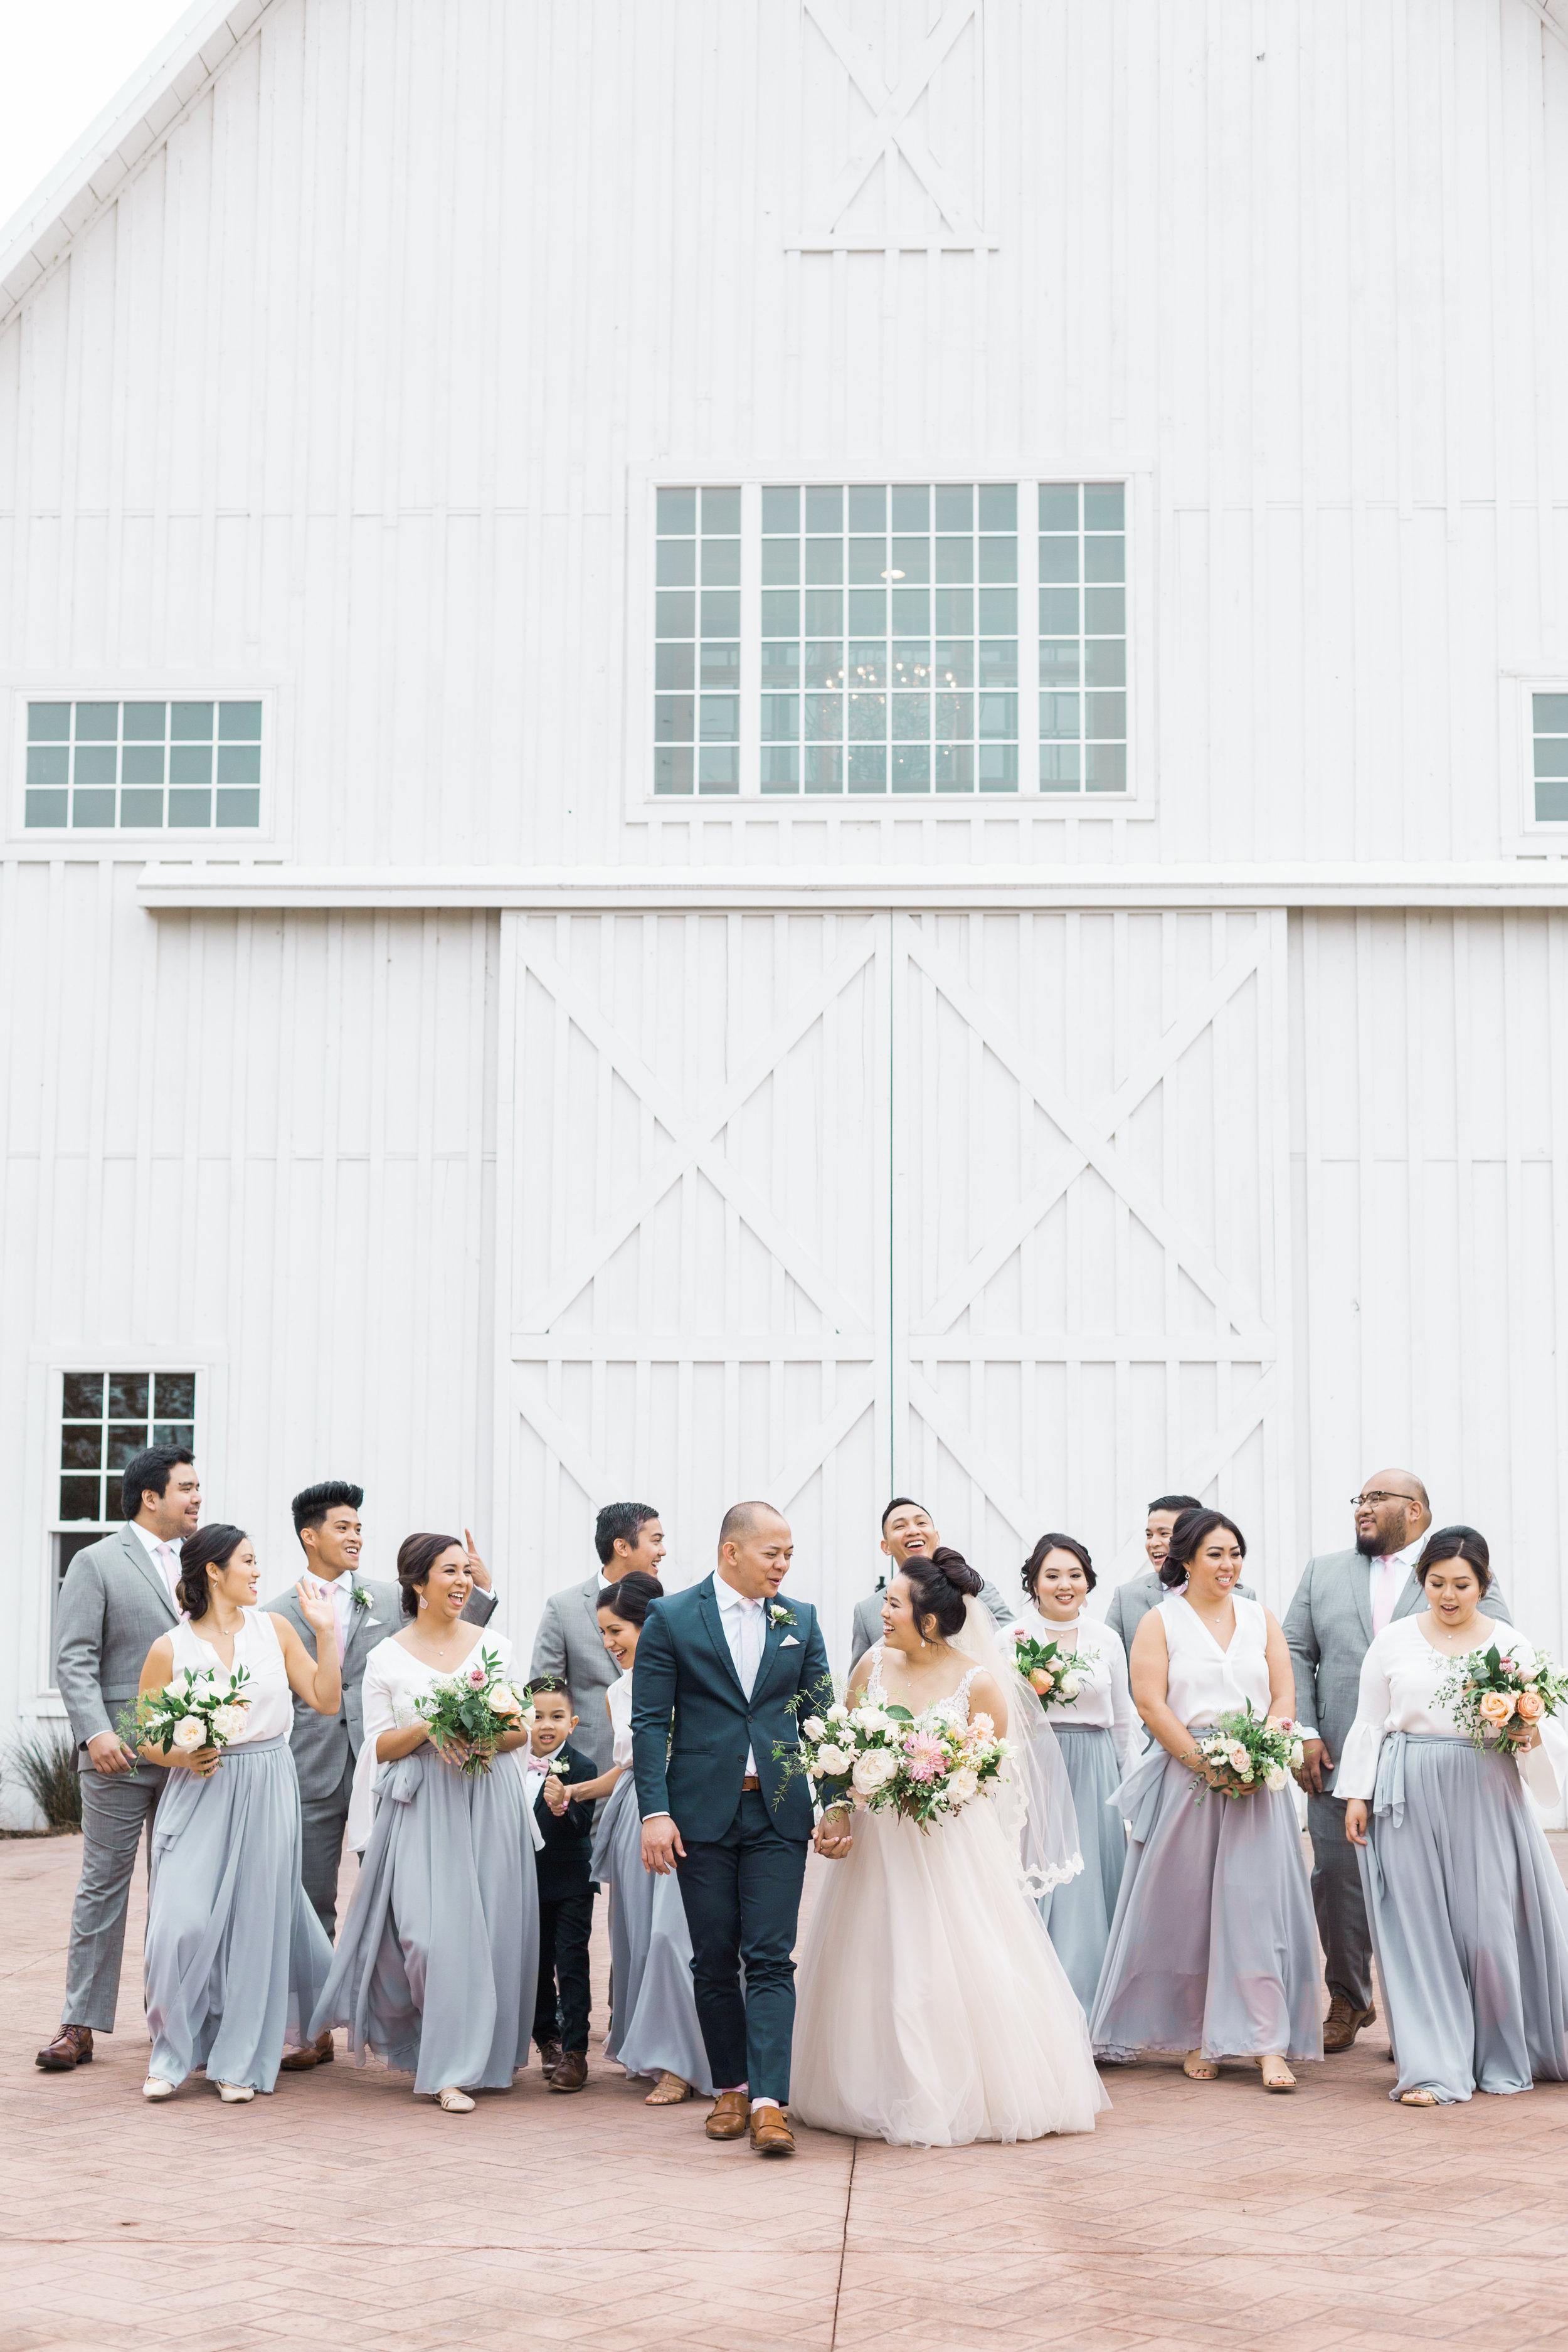 Lucy+JB Wedding_362 copy.JPG